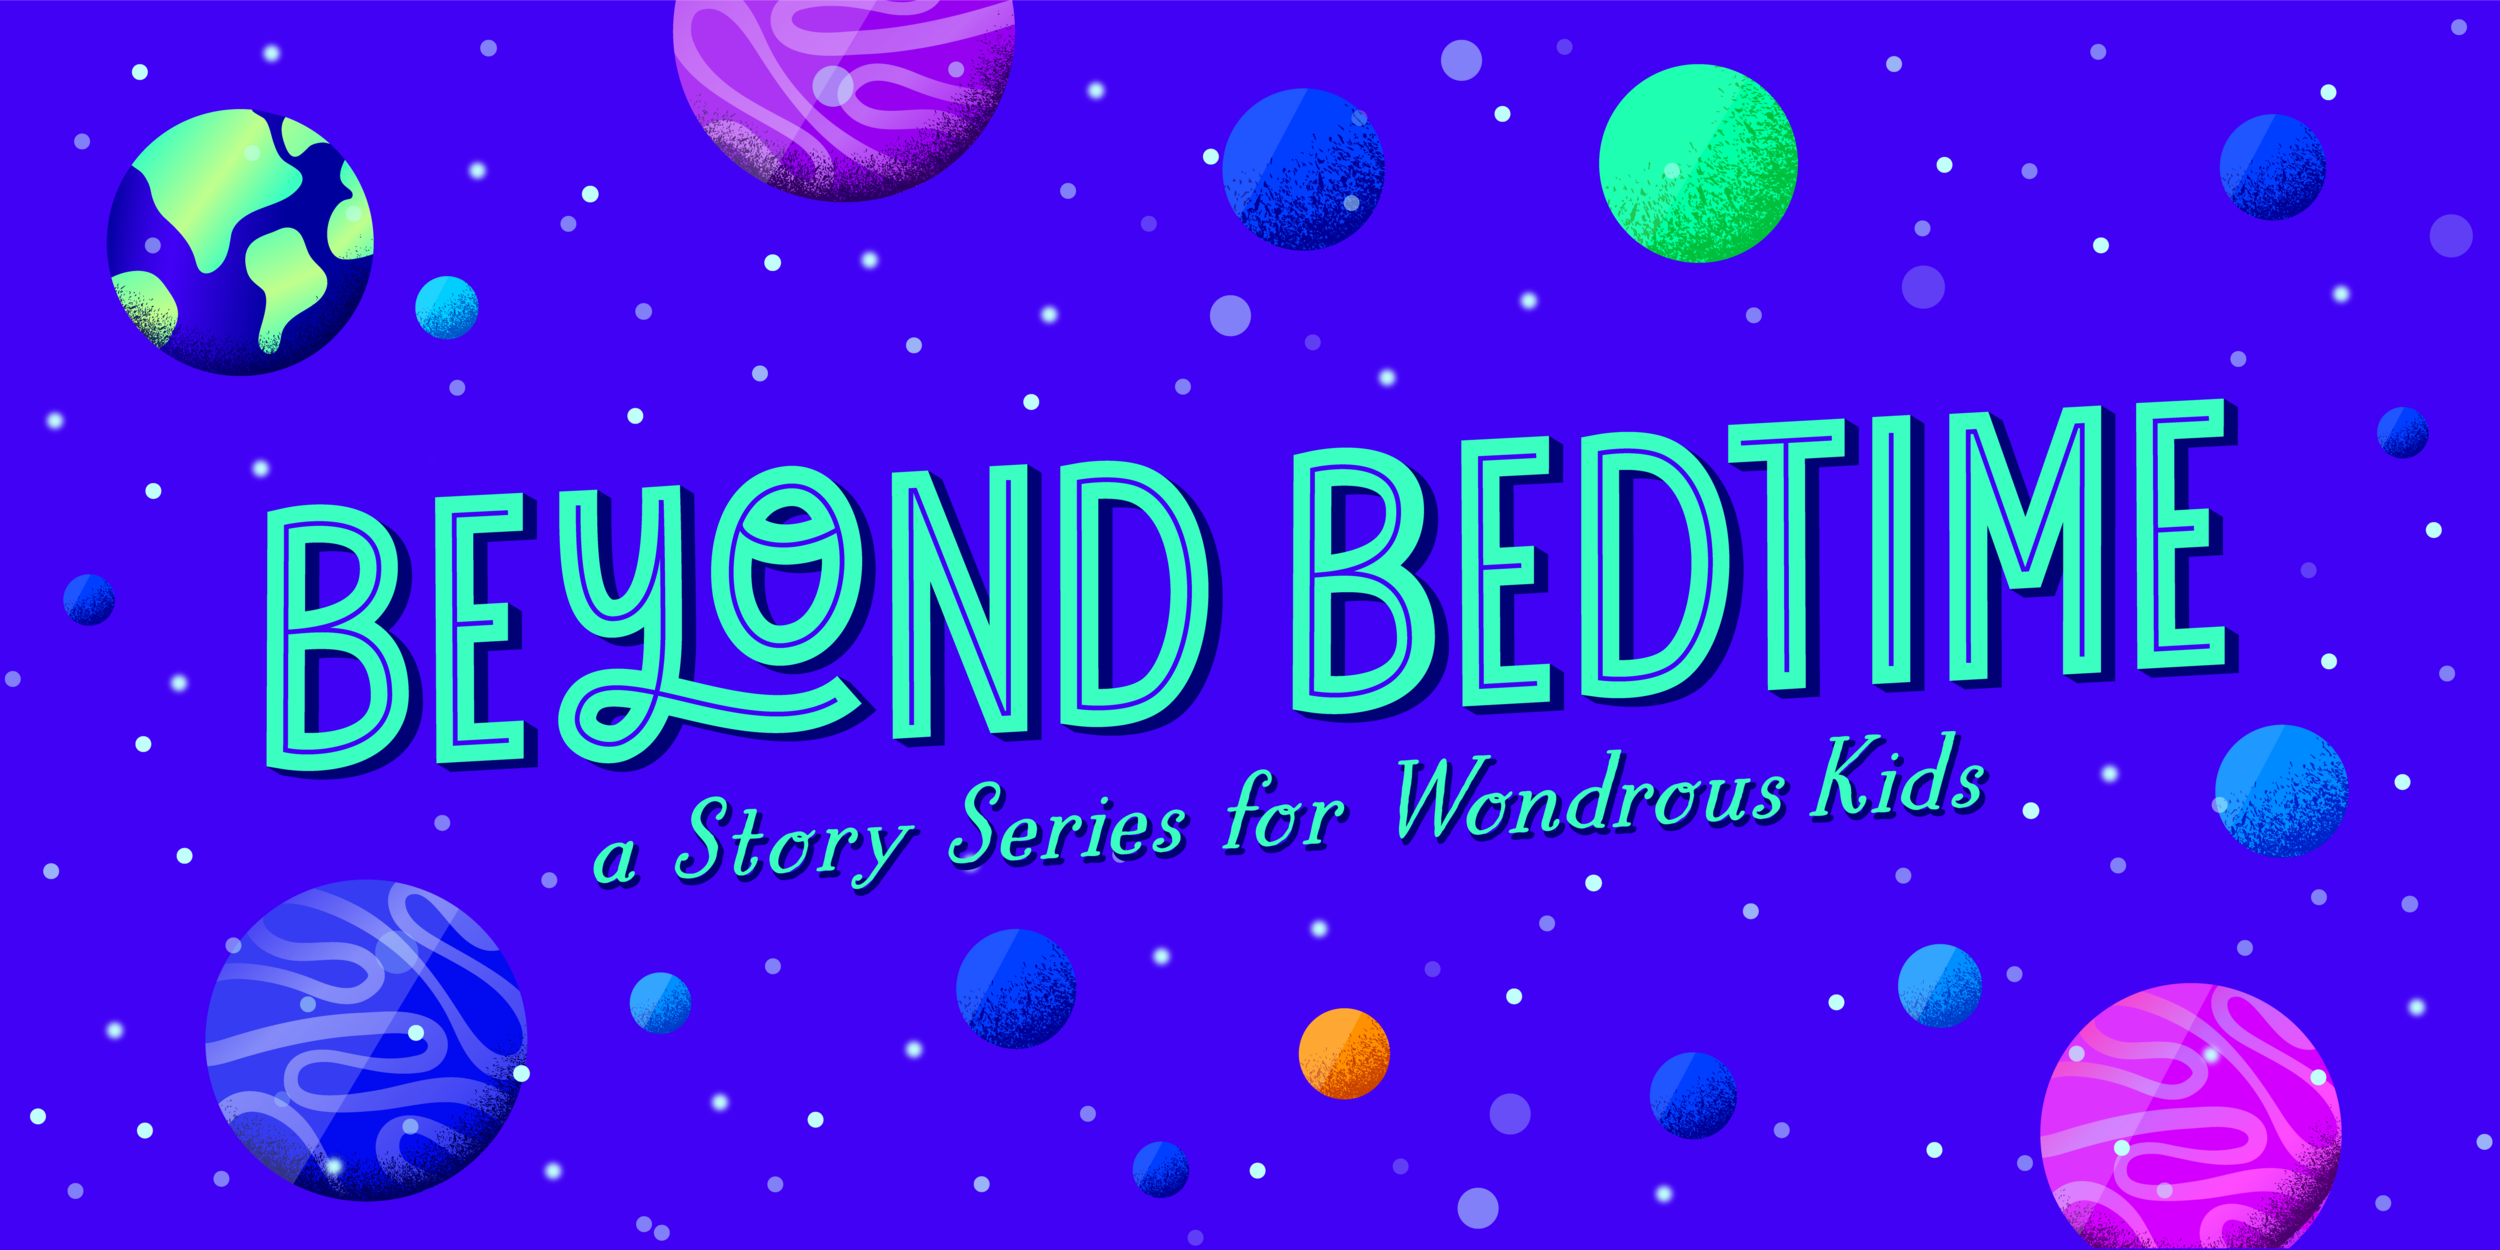 BeyondBedtime_YouTubebannerB.png